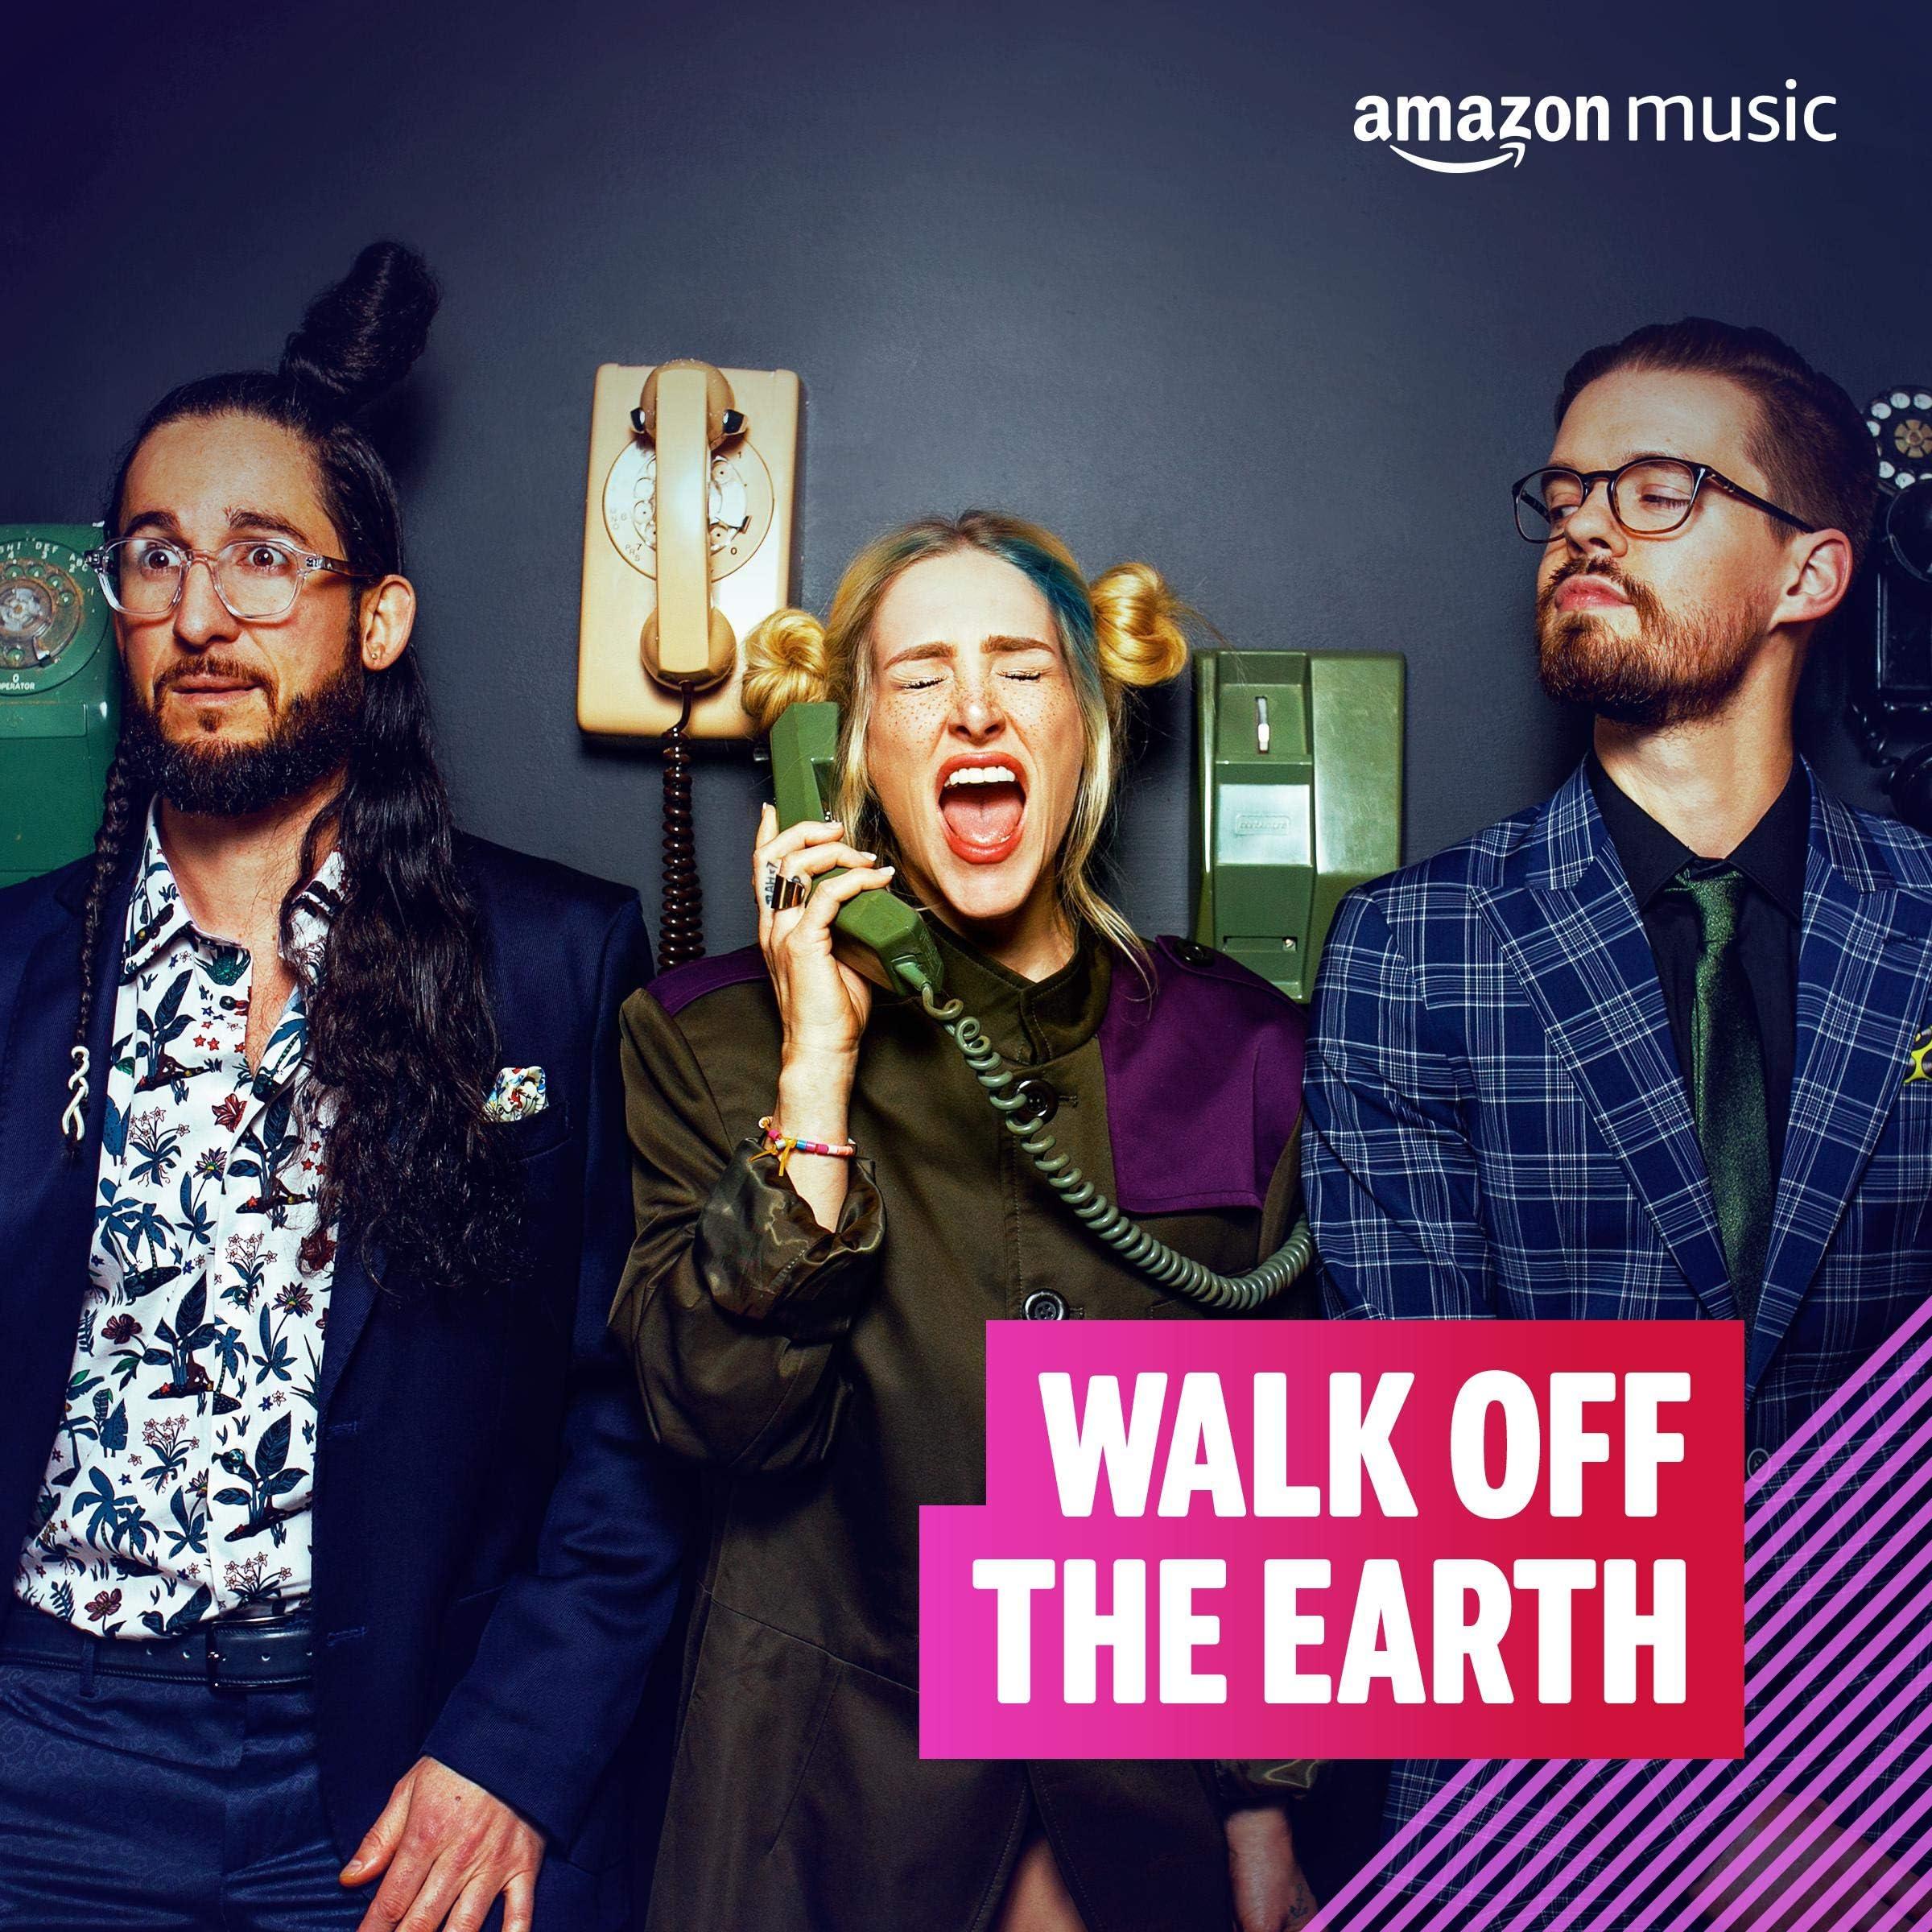 Walk off the Earth